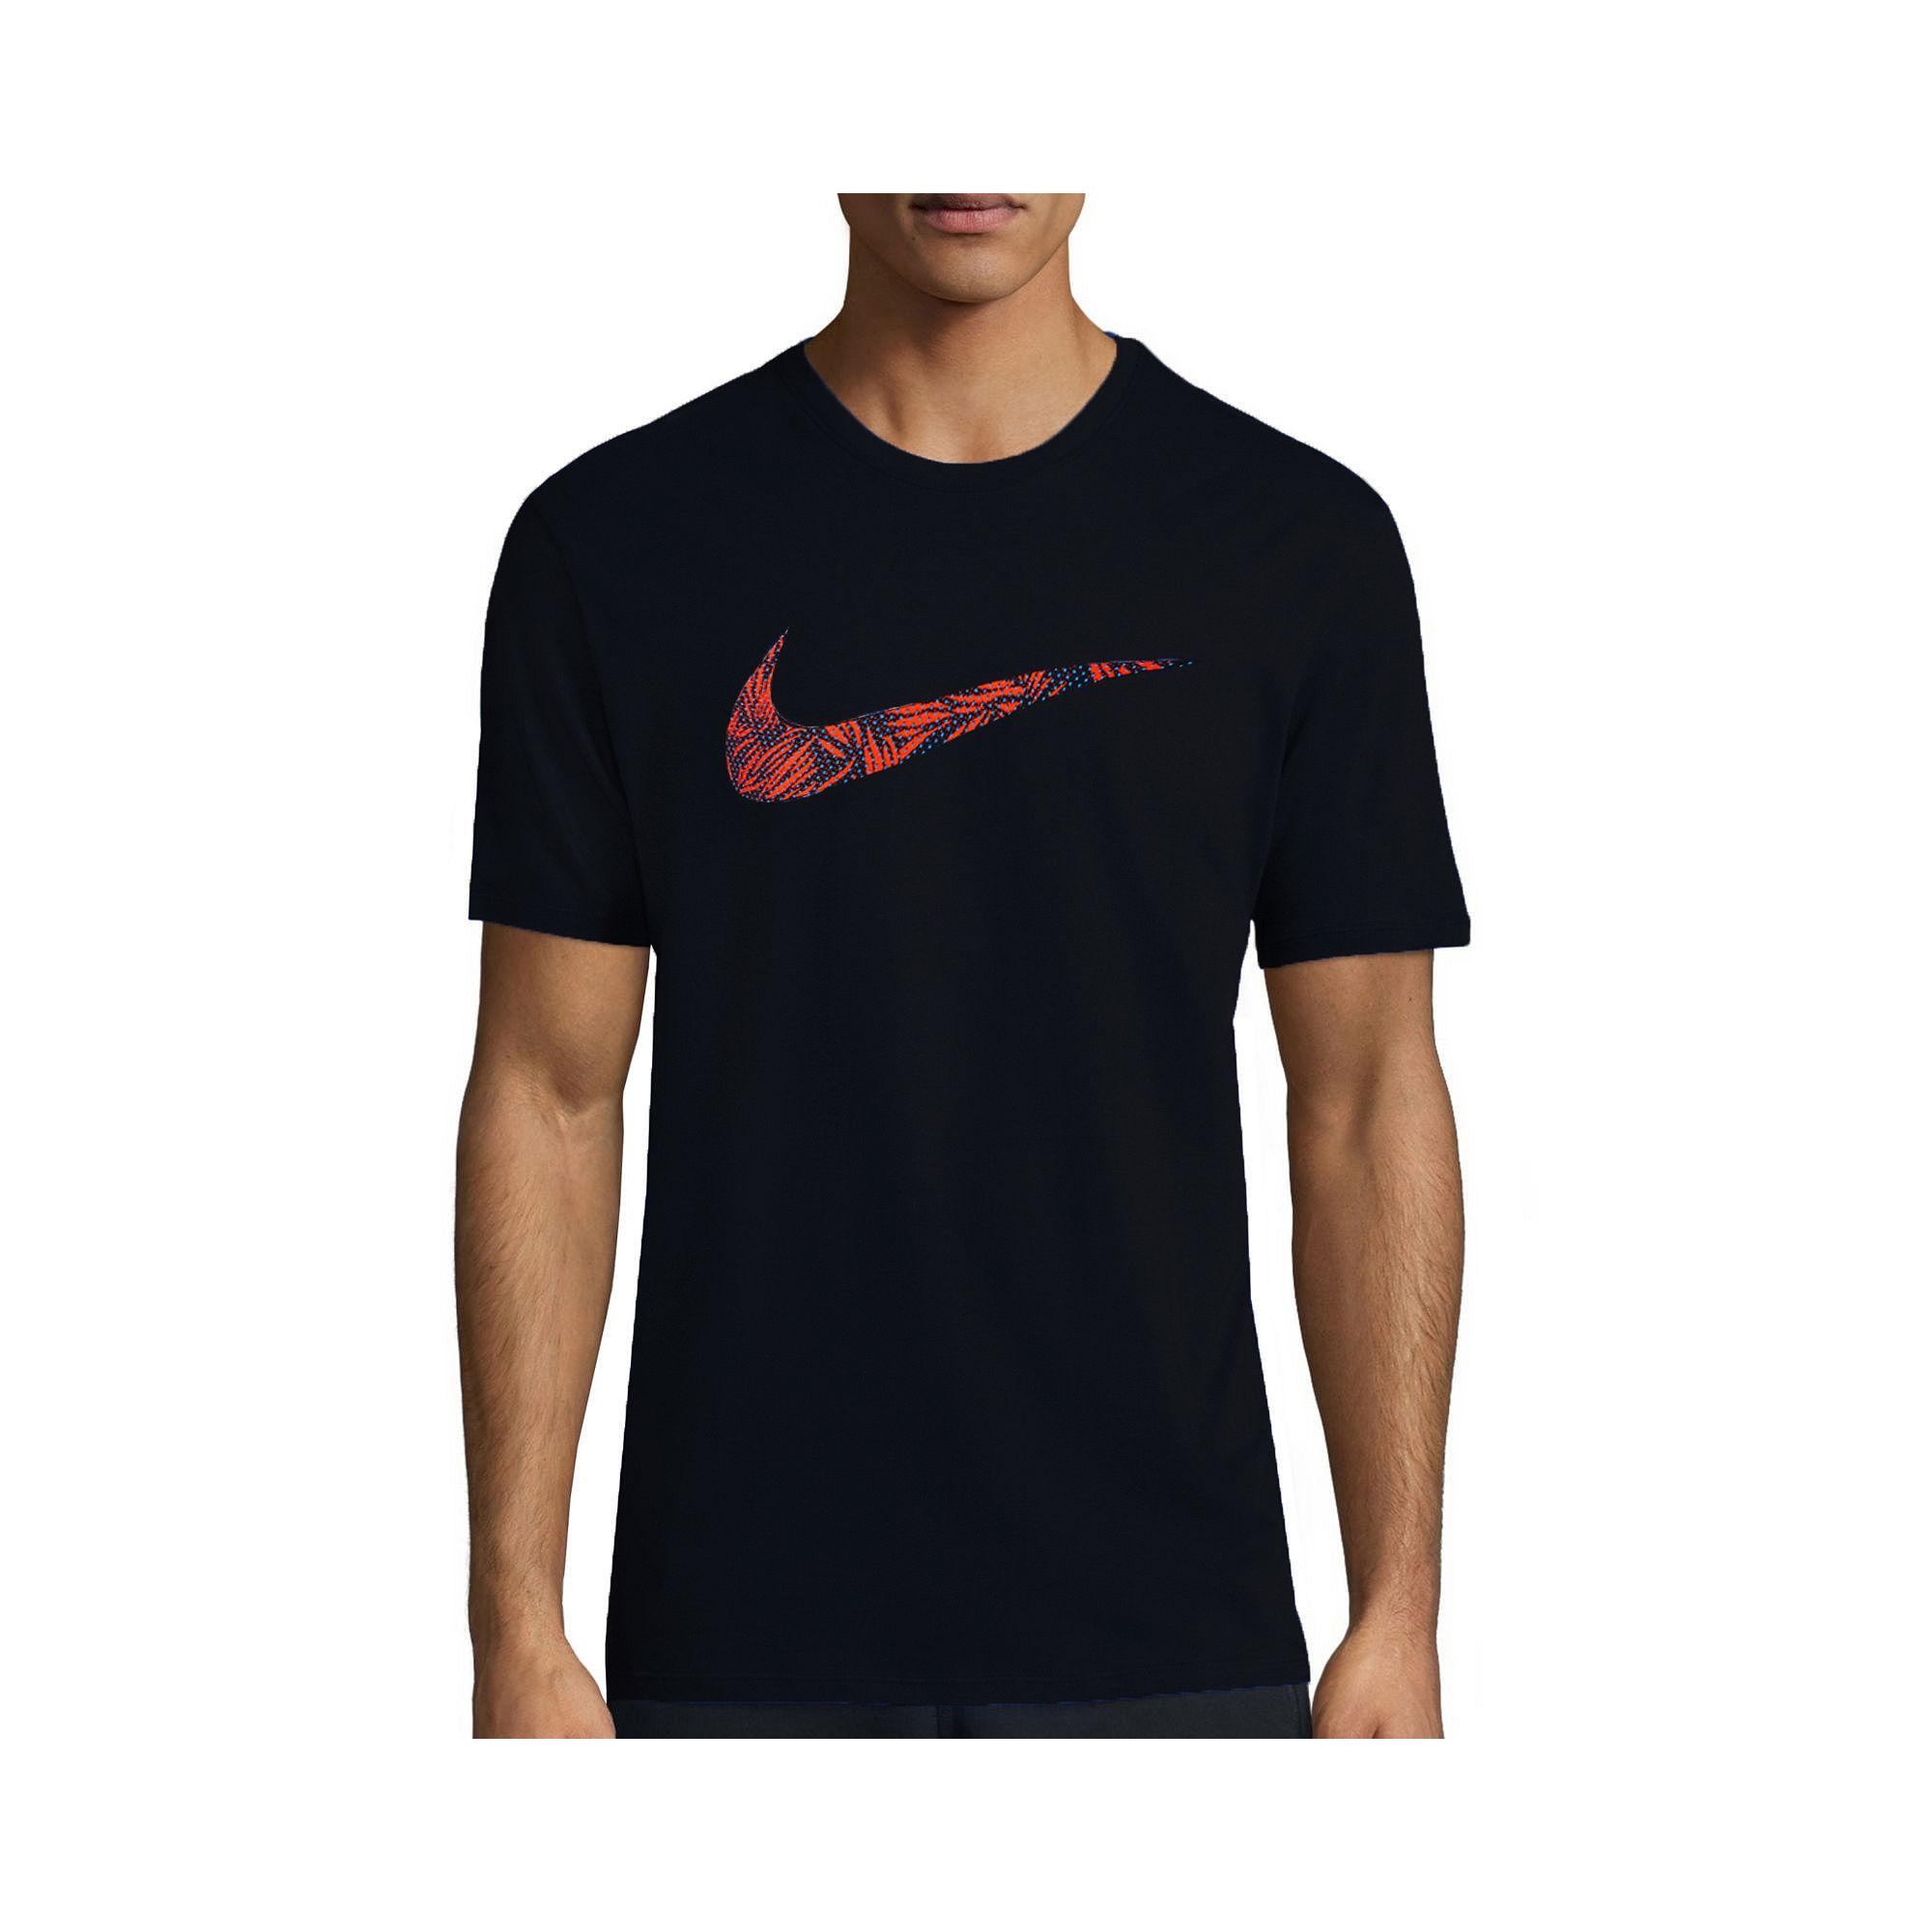 e272220c ... UPC 666032869789 product image for Nike Palm Print Swoosh Tee |  upcitemdb.com ...